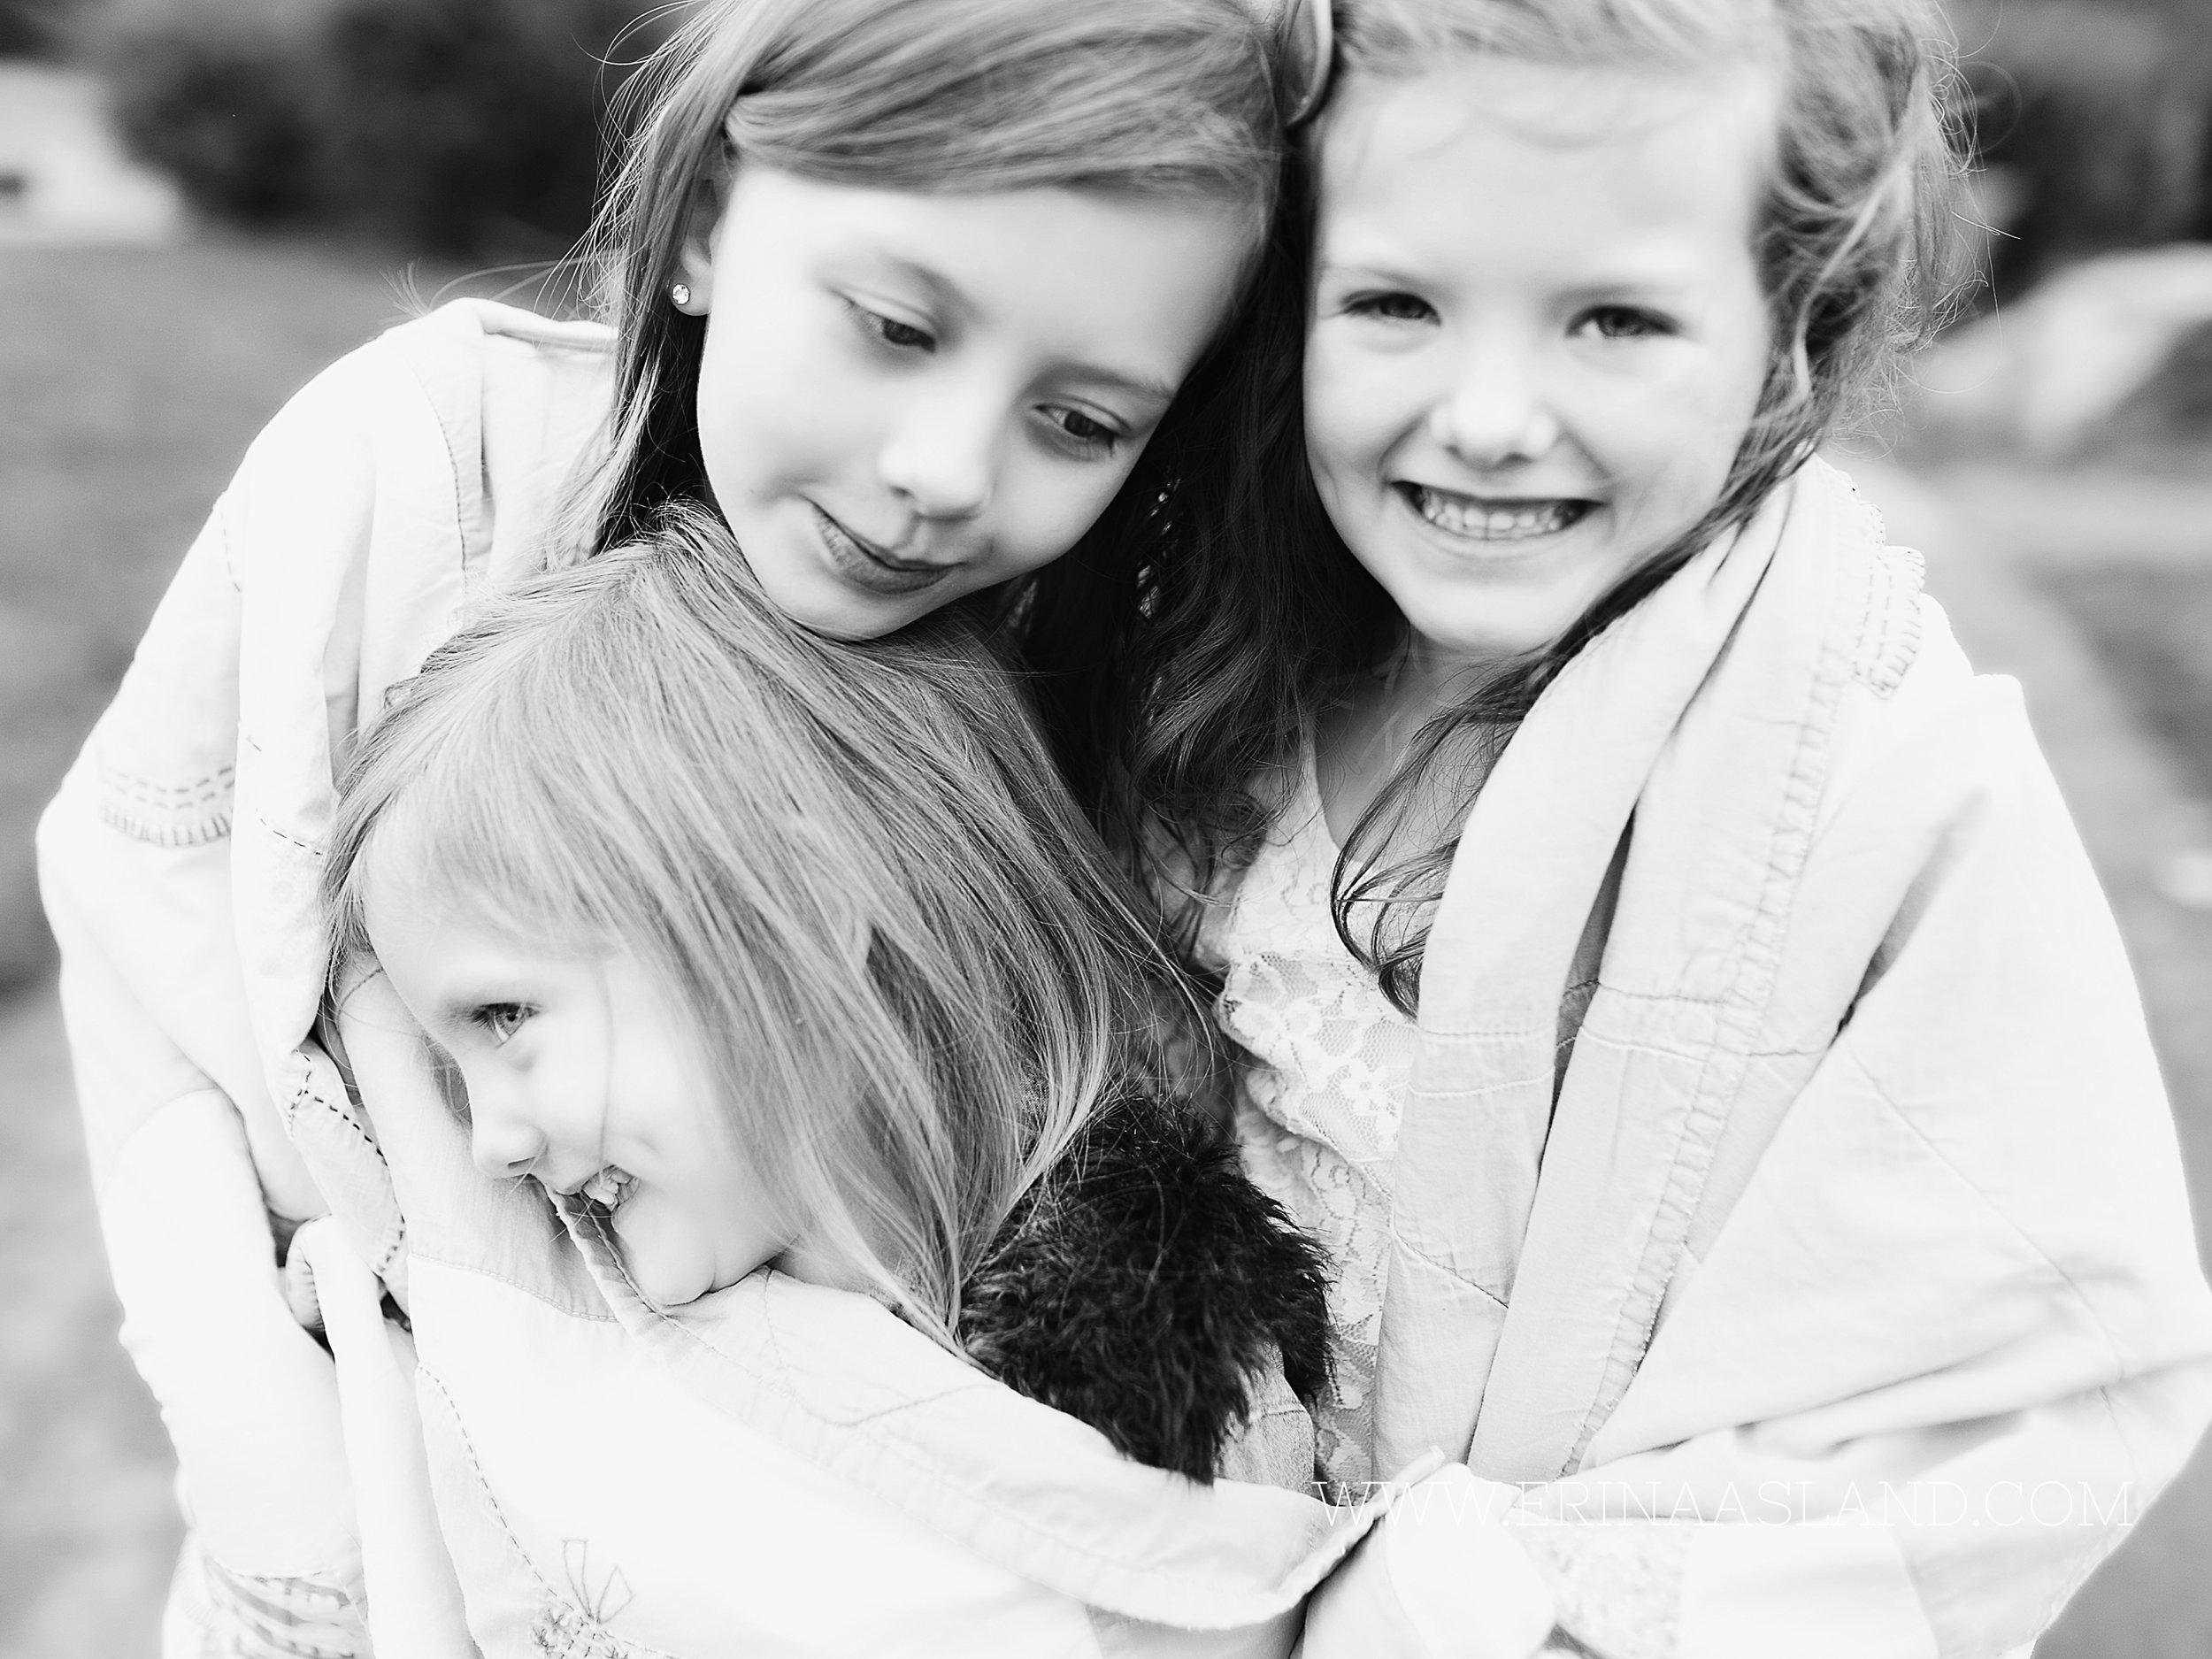 Erin Aasland Snoqualmie Children Photographer blanket sisters hug